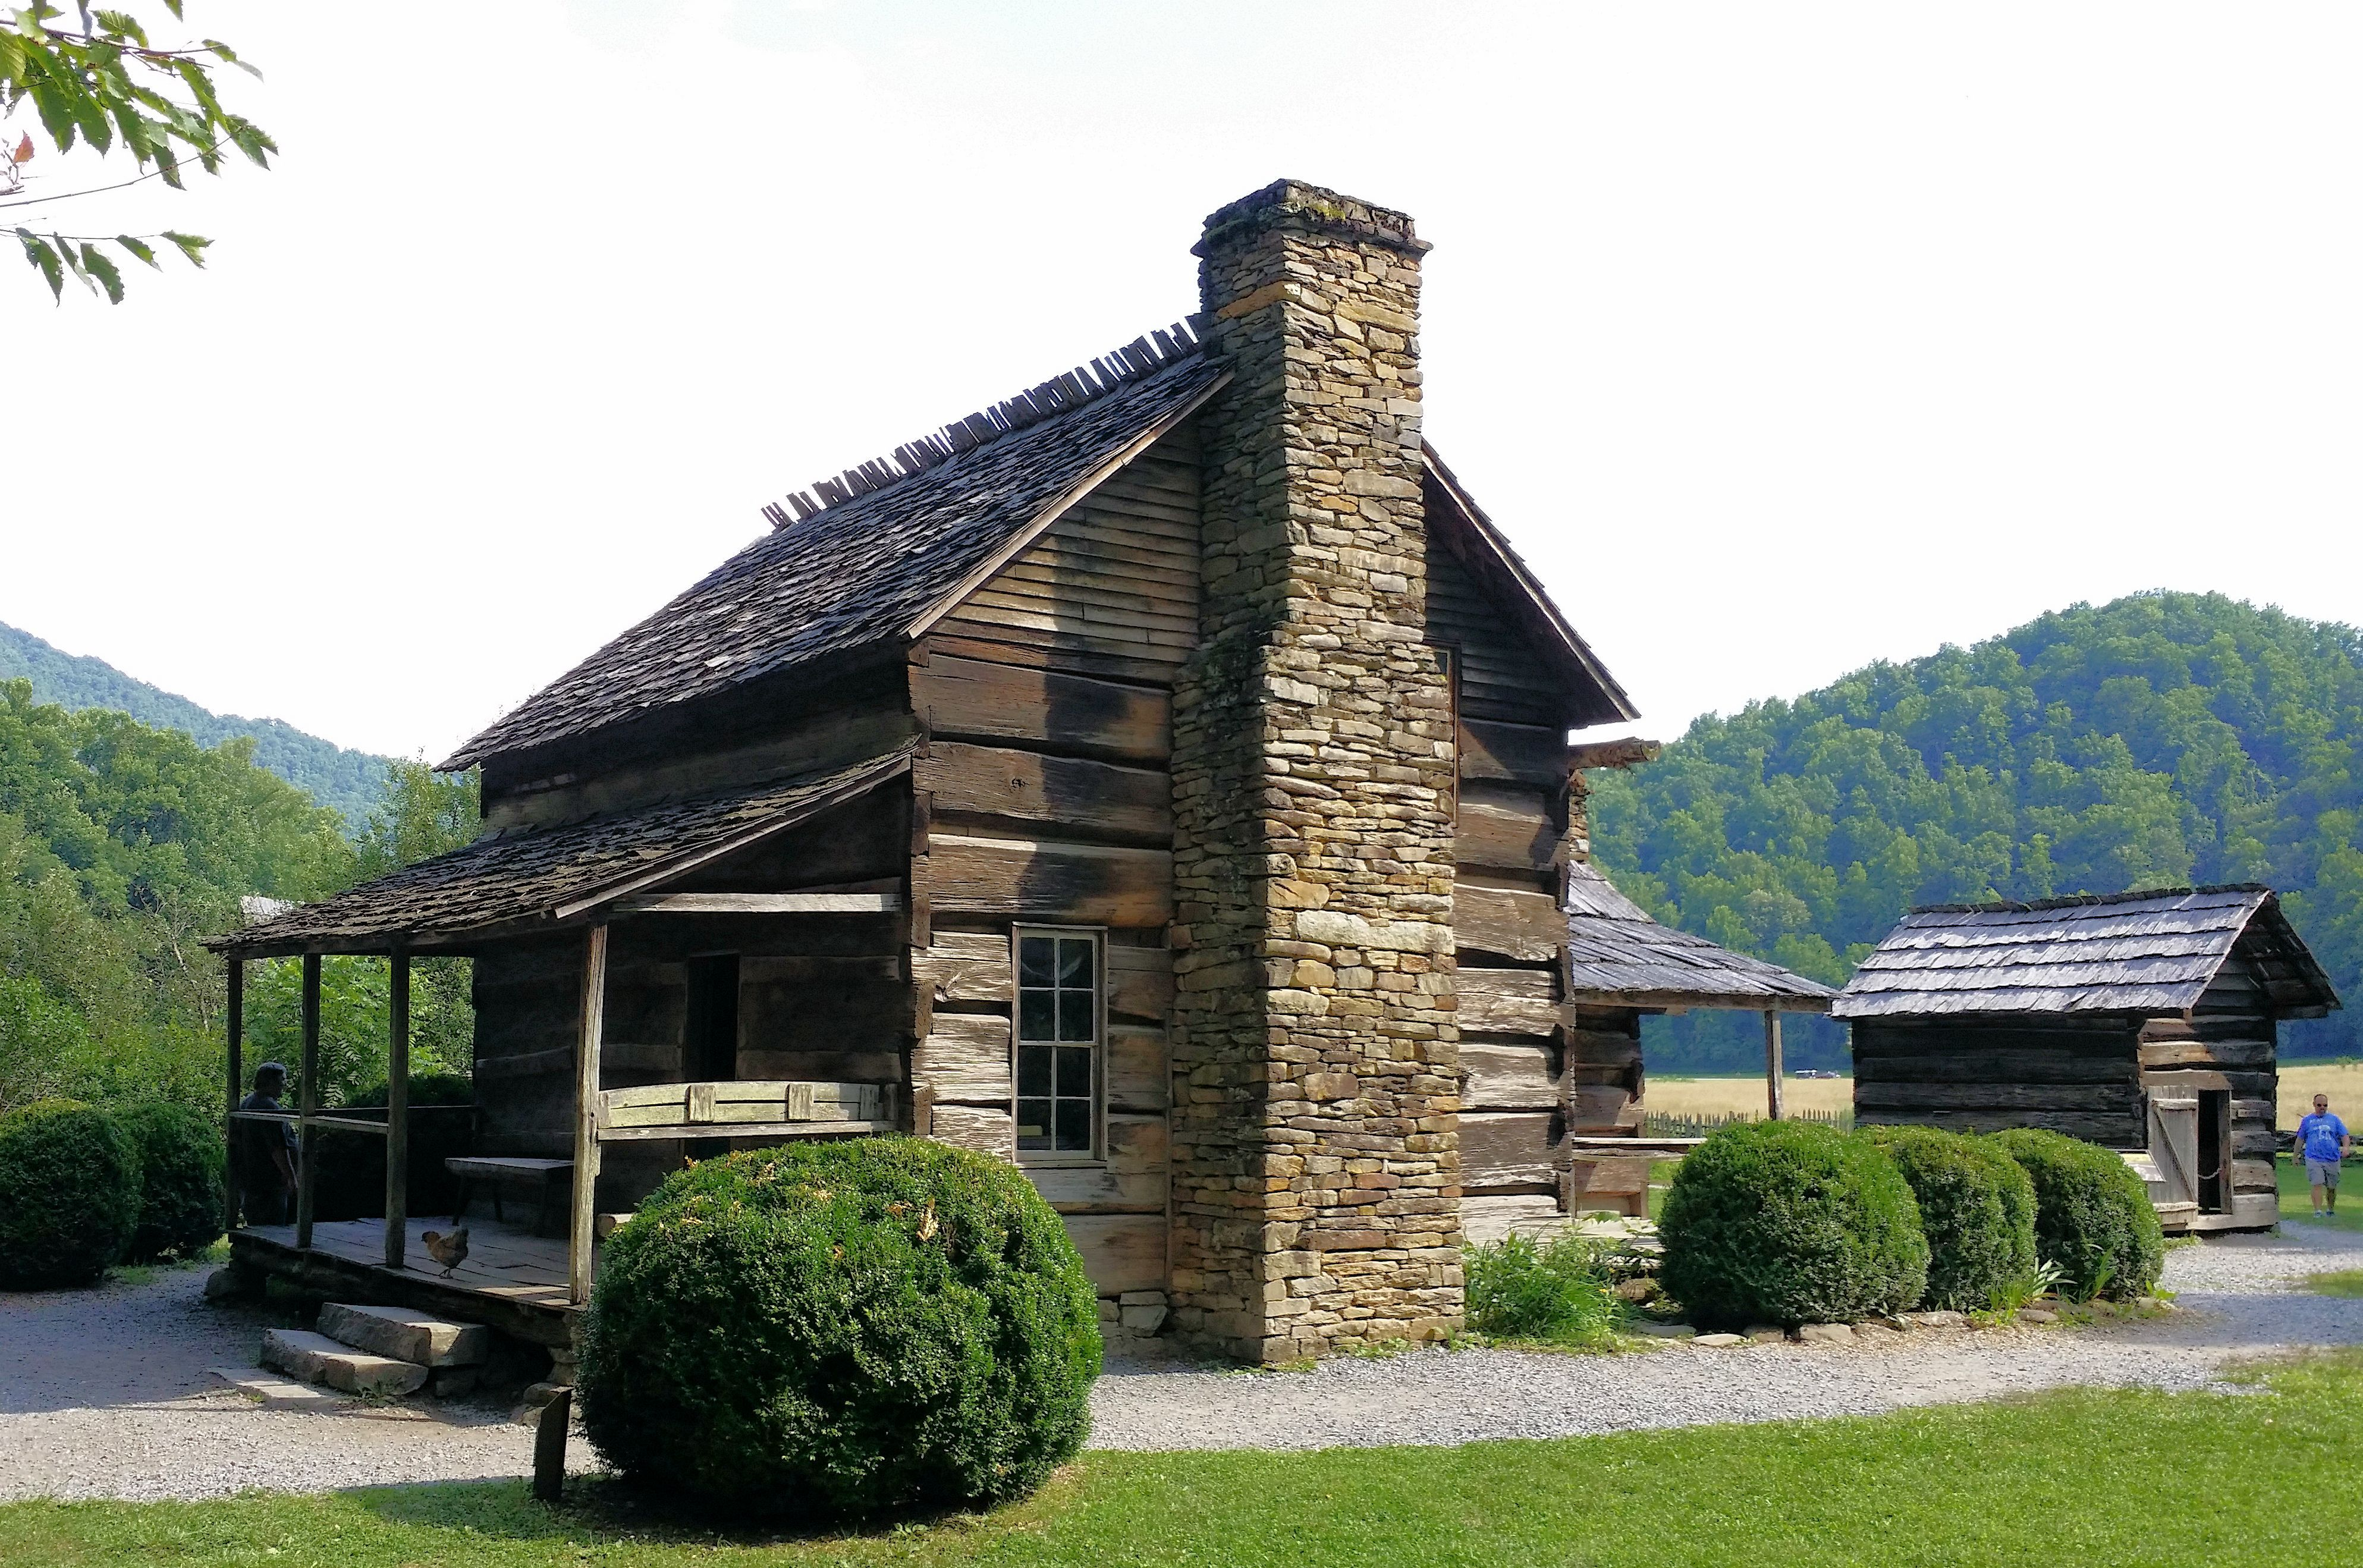 The old John Davis cabin at the Oconaluftee Mountain Farm